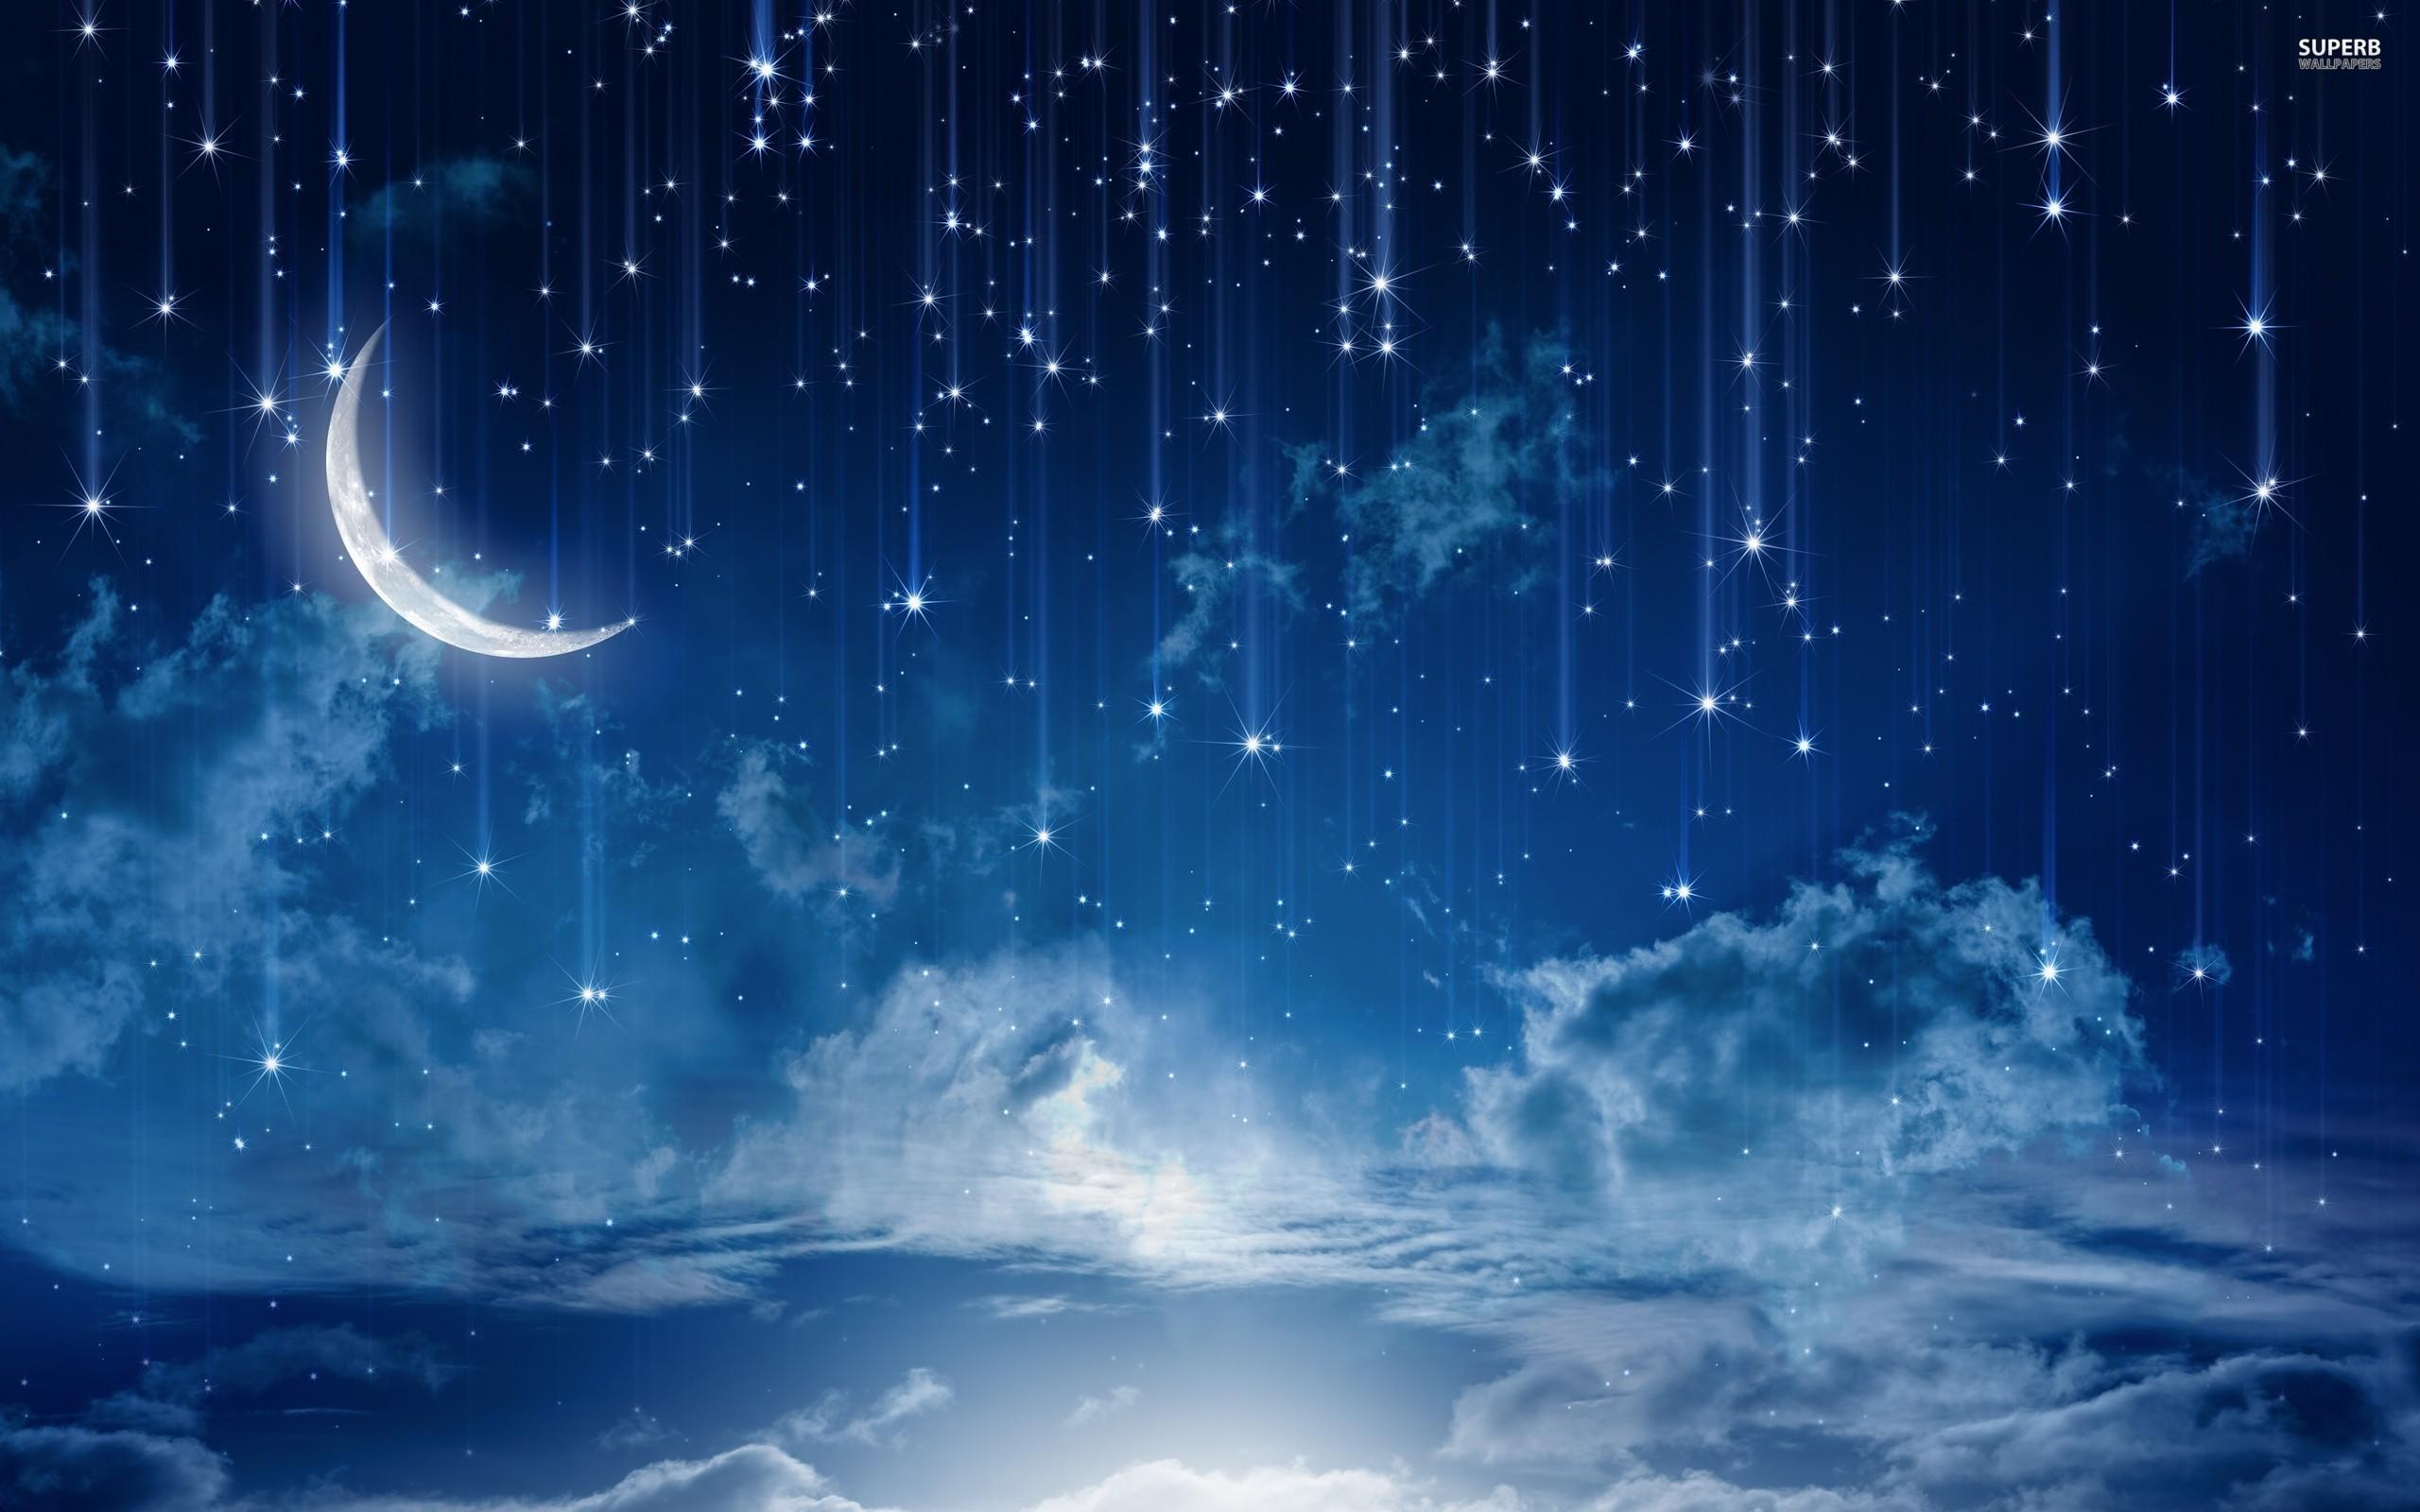 2560x1440 Starry Night Sky | Sky HD Wallpaper